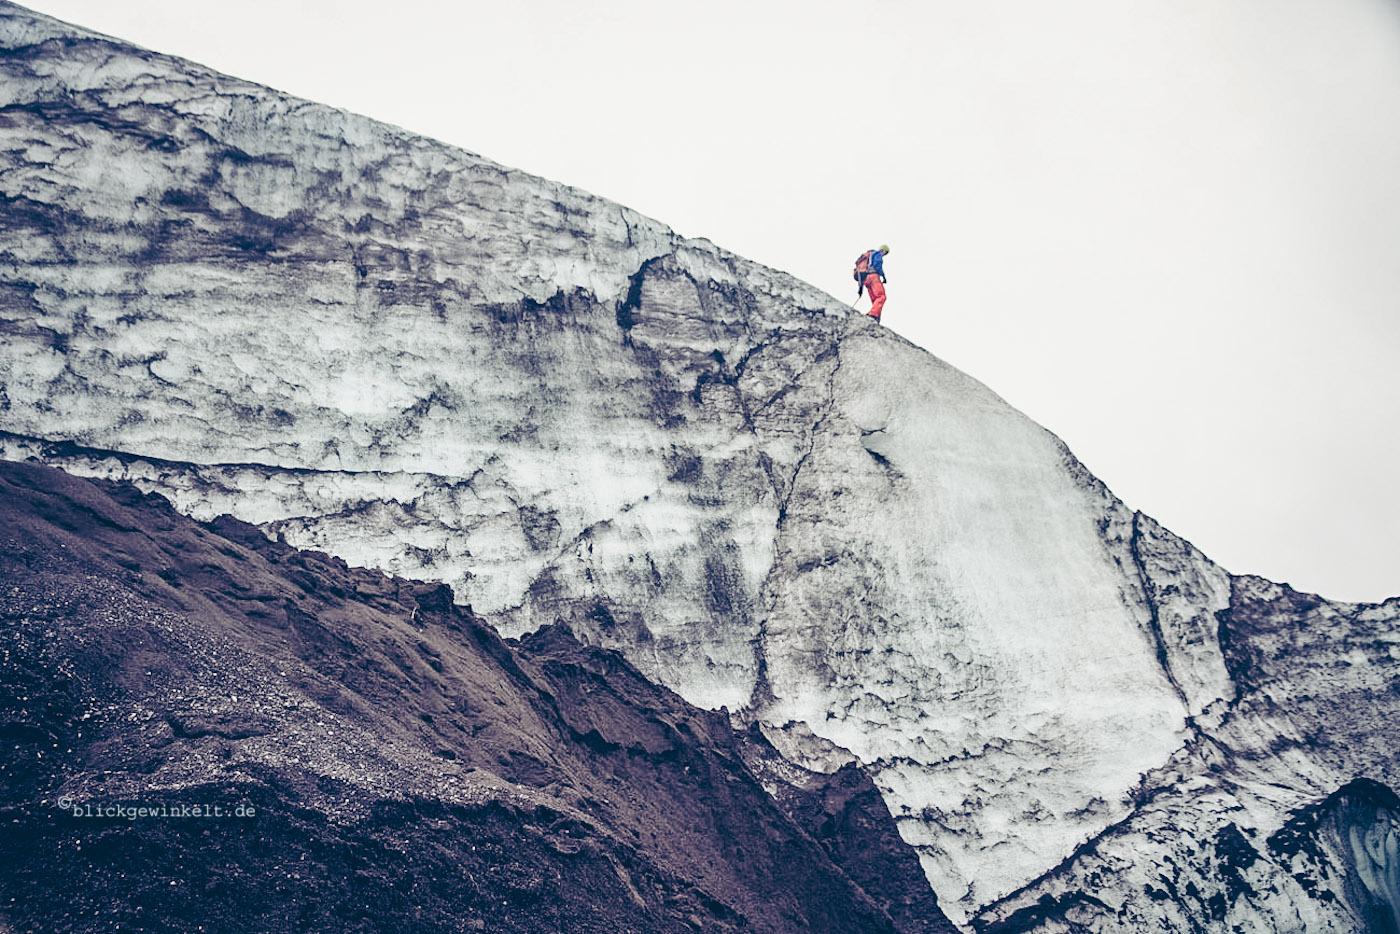 hoher Eisberg